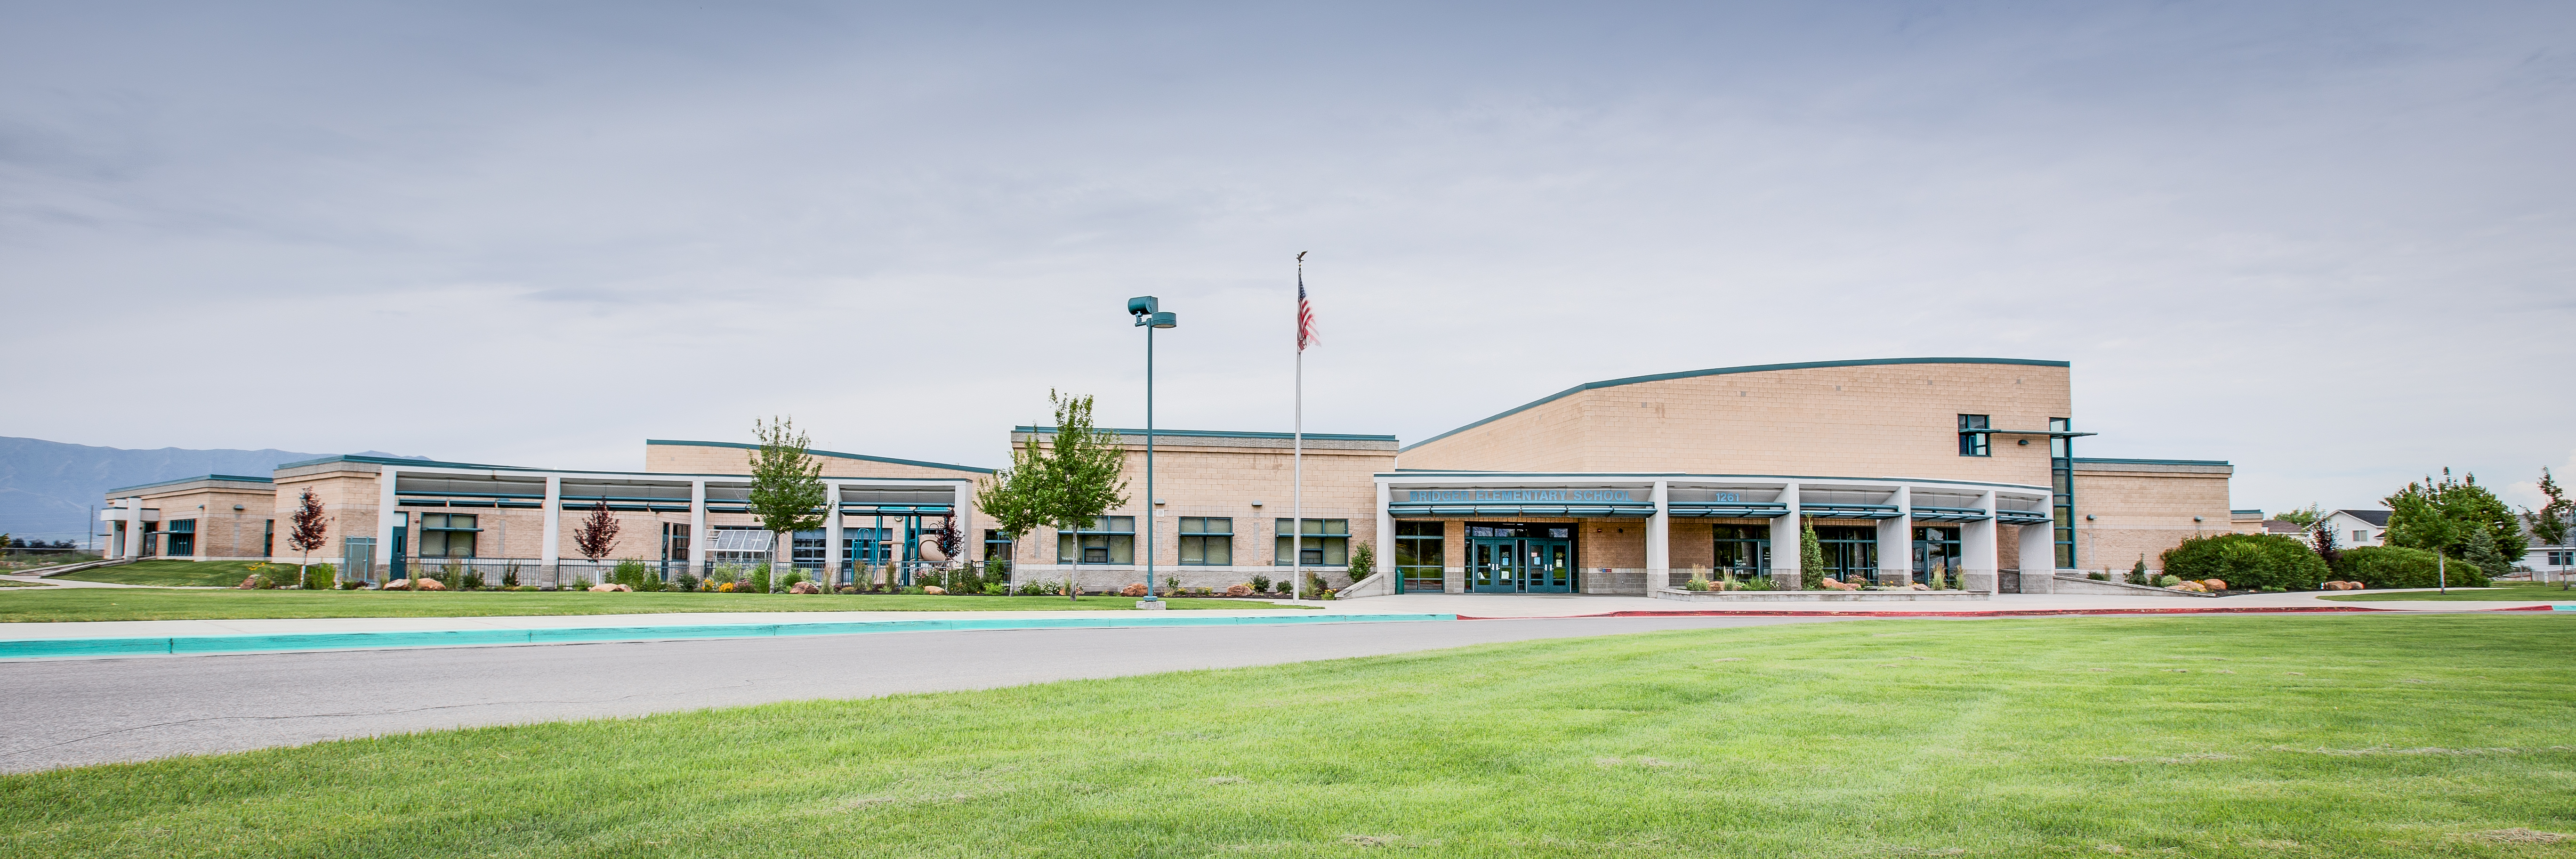 Bridger Elementary School - Logan, UT